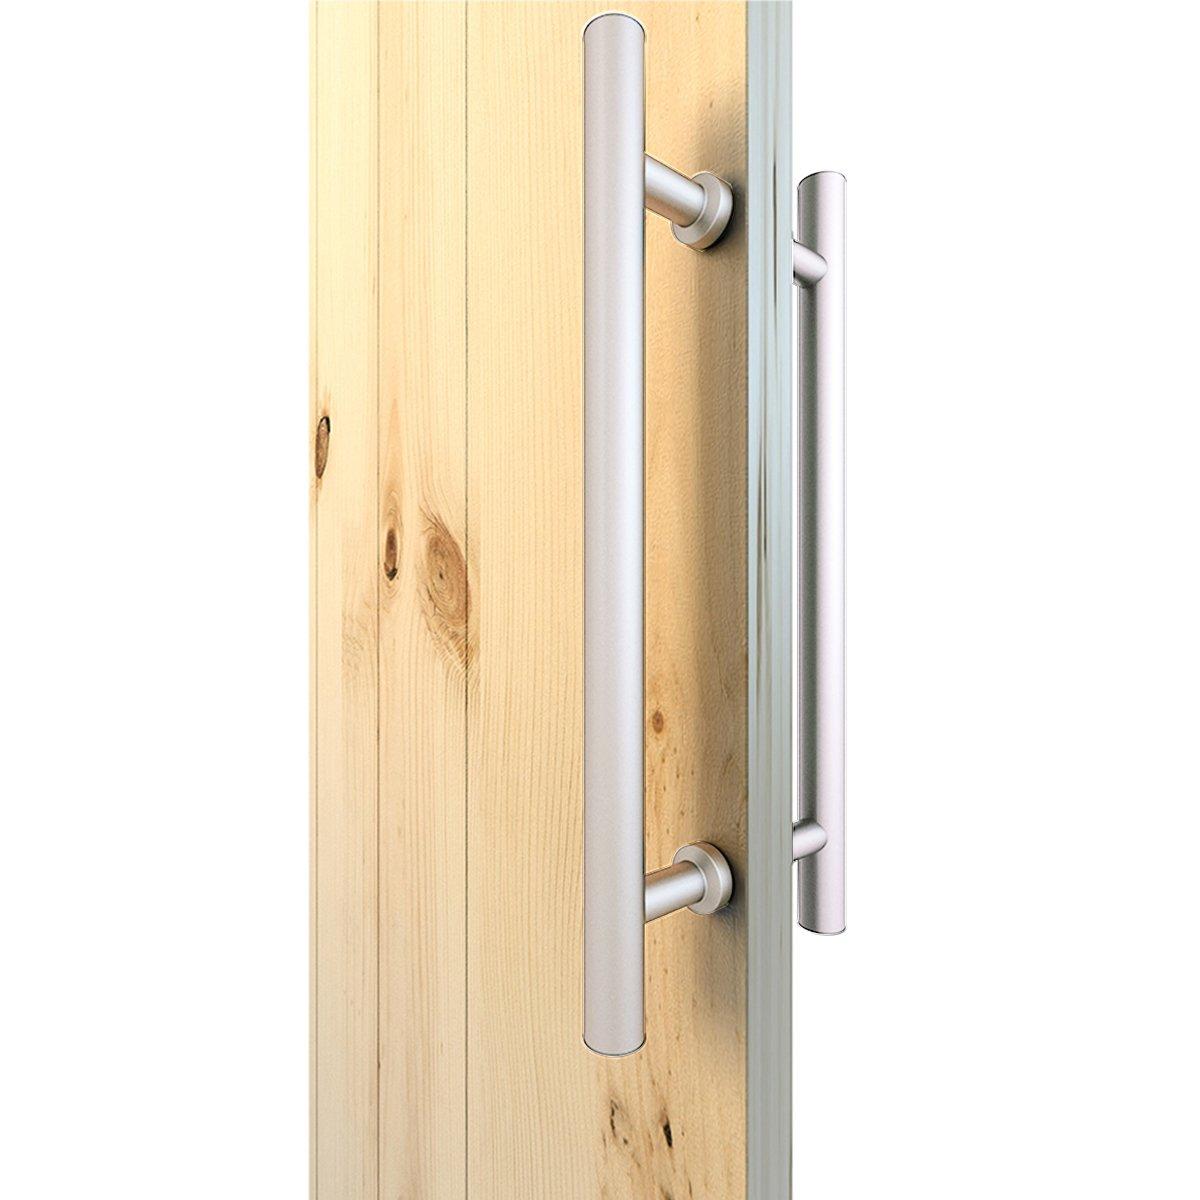 JUBEST Stainless Steel Wooden Barn Door Sliding Door Pull Handle Set Double Side Hardware by JUBEST (Image #1)